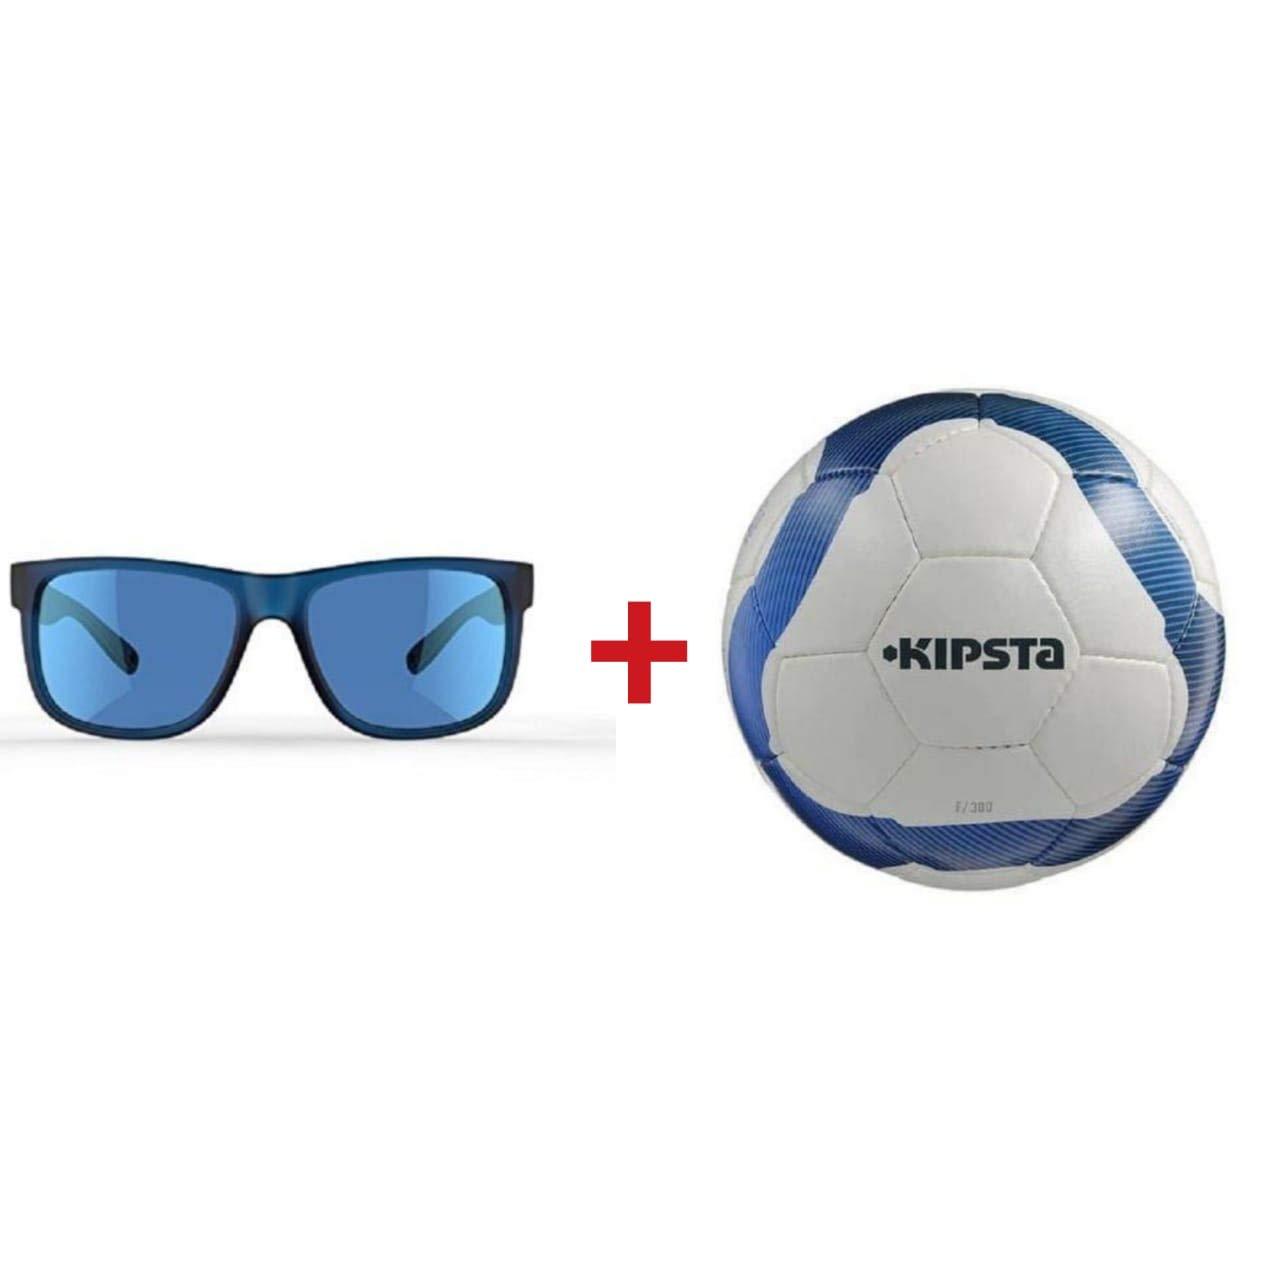 KIPSTA フットボールサイズ5クィクアMH 540大人用サングラスゴーグル 2個パック B07JPGLQ1X